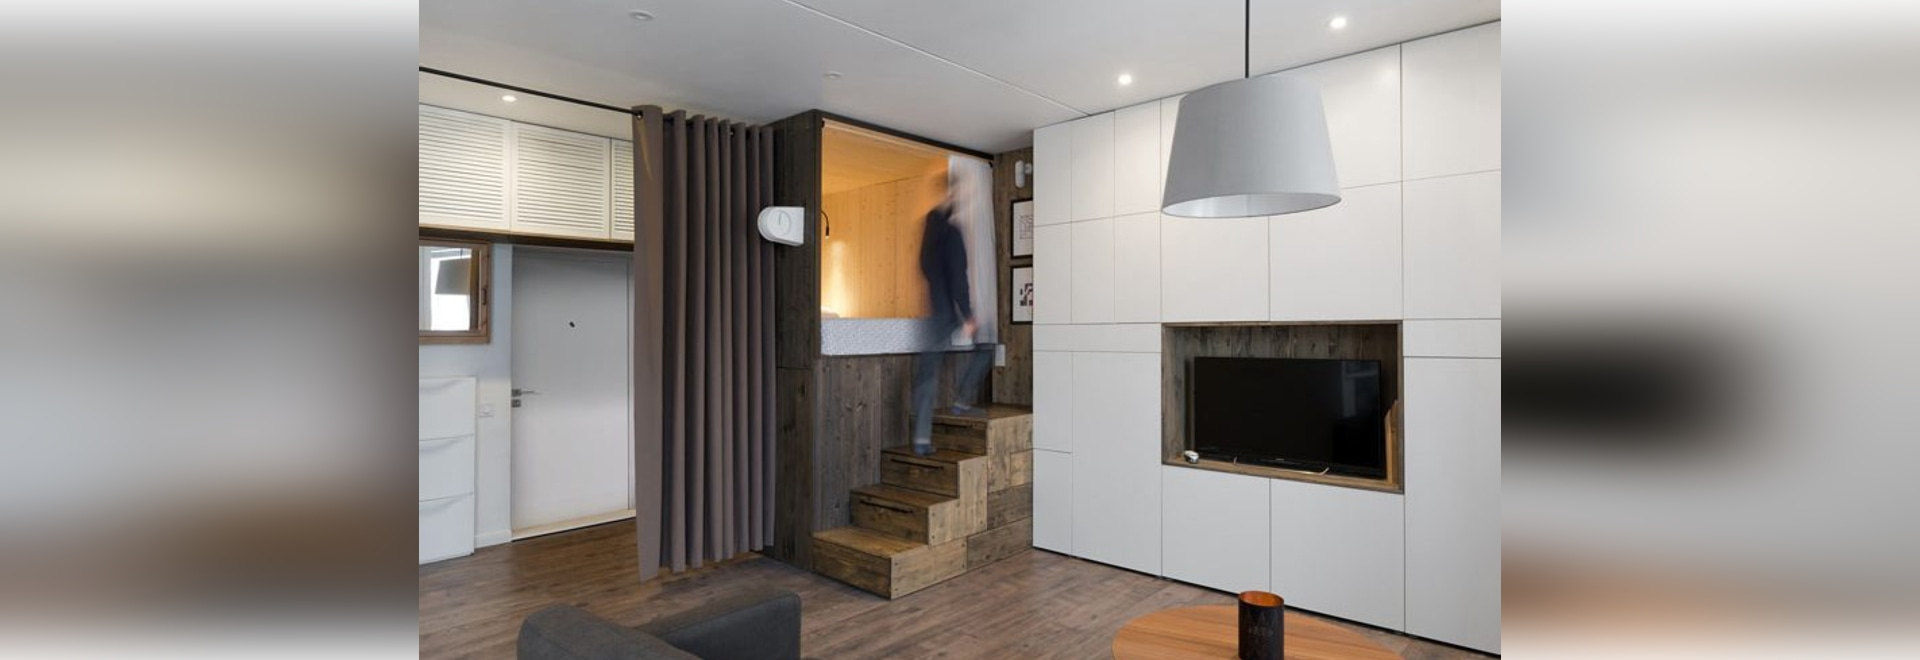 Chambre A Couche Petite - Amazing Home Ideas - freetattoosdesign.us